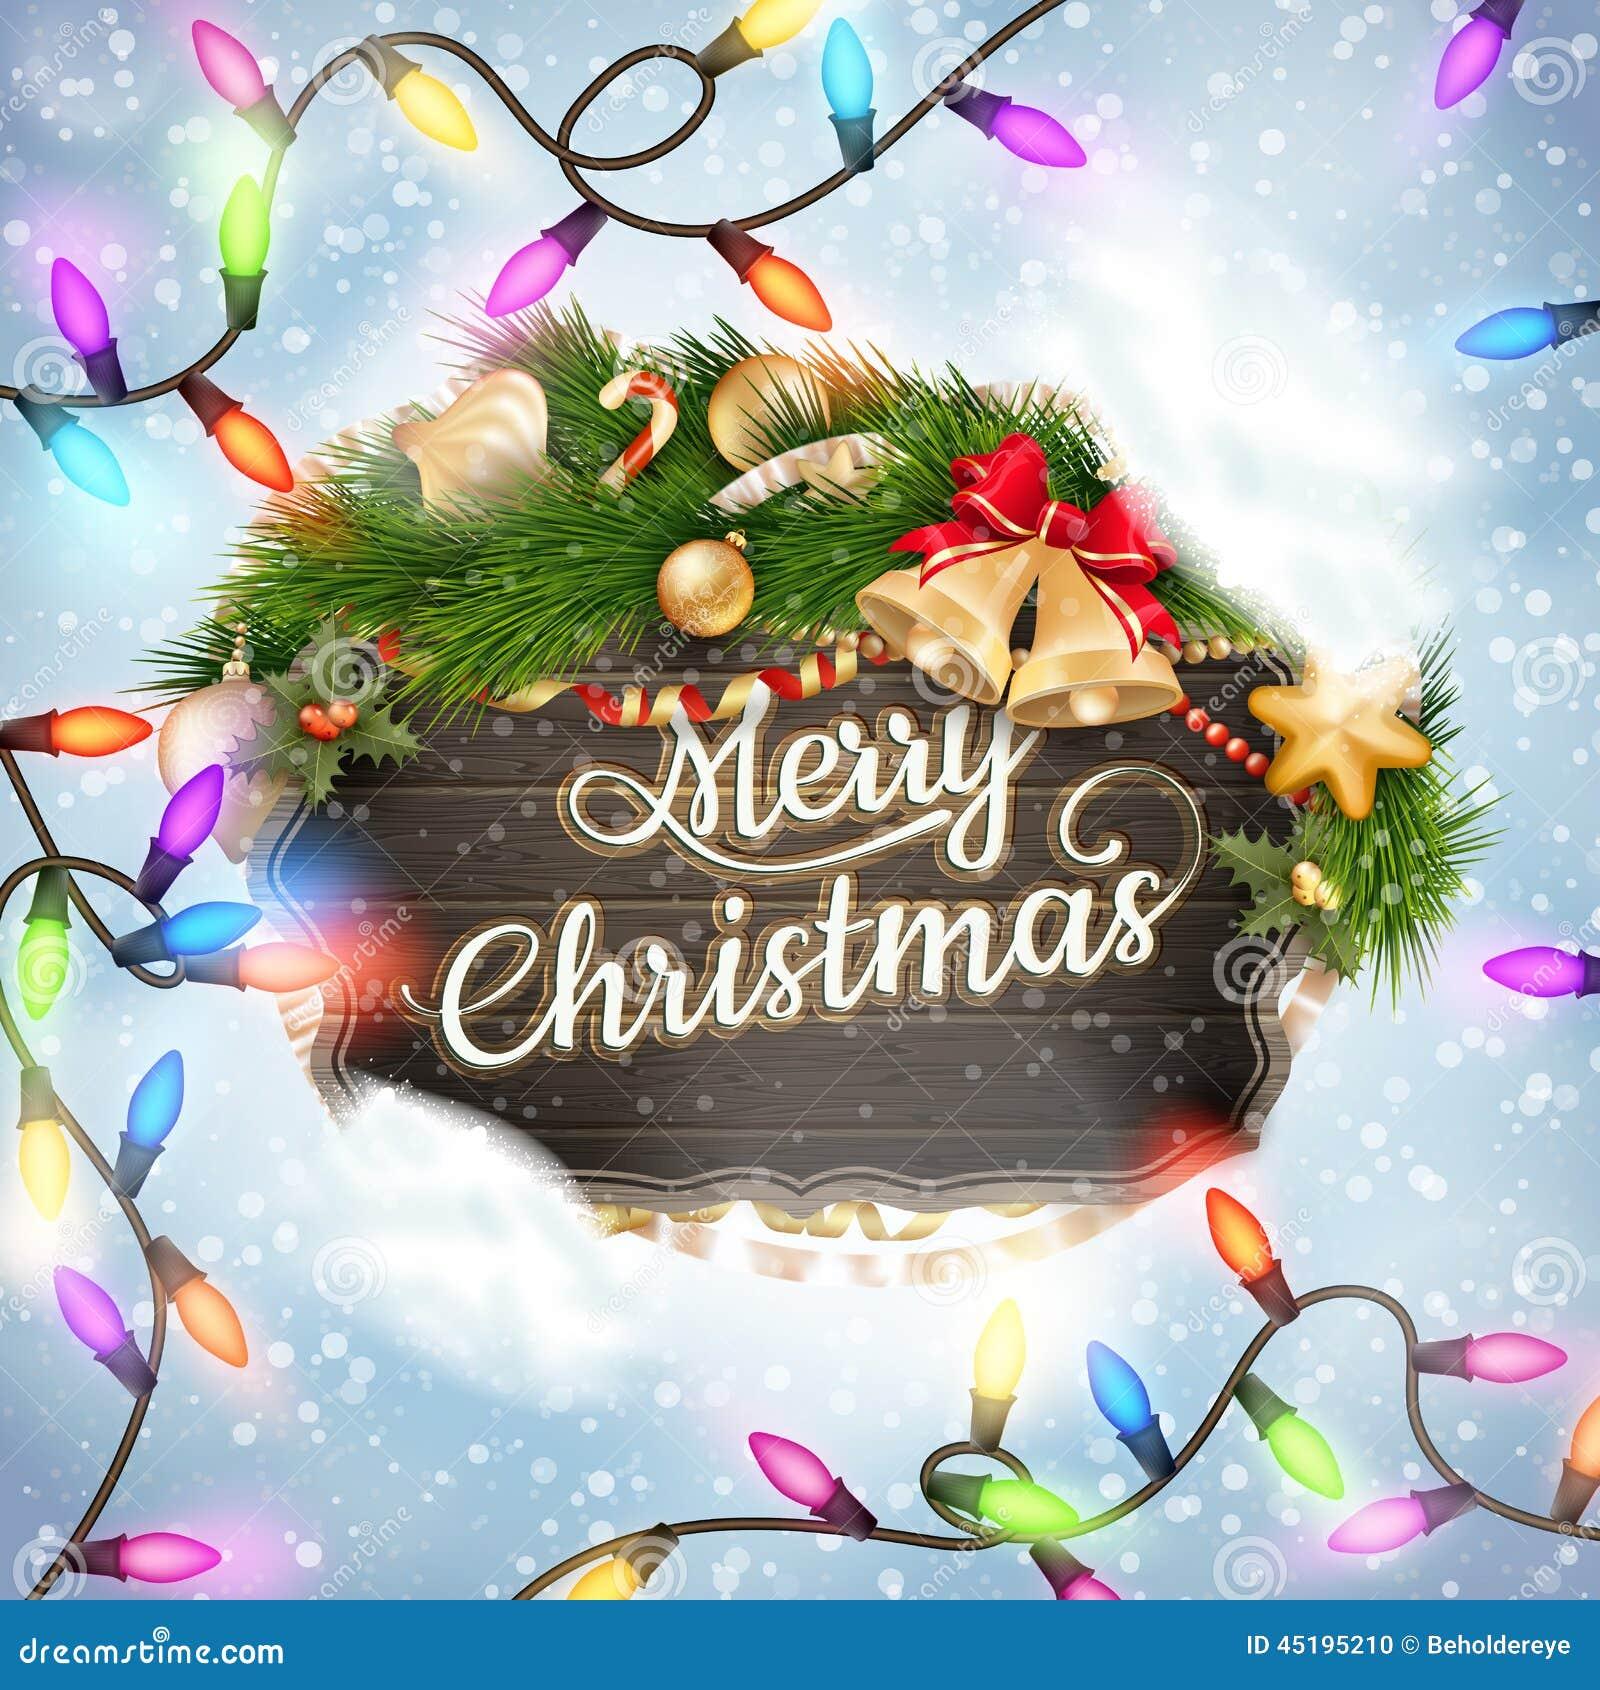 Merry Christmas Wooden Board Garland Stock Vector ...